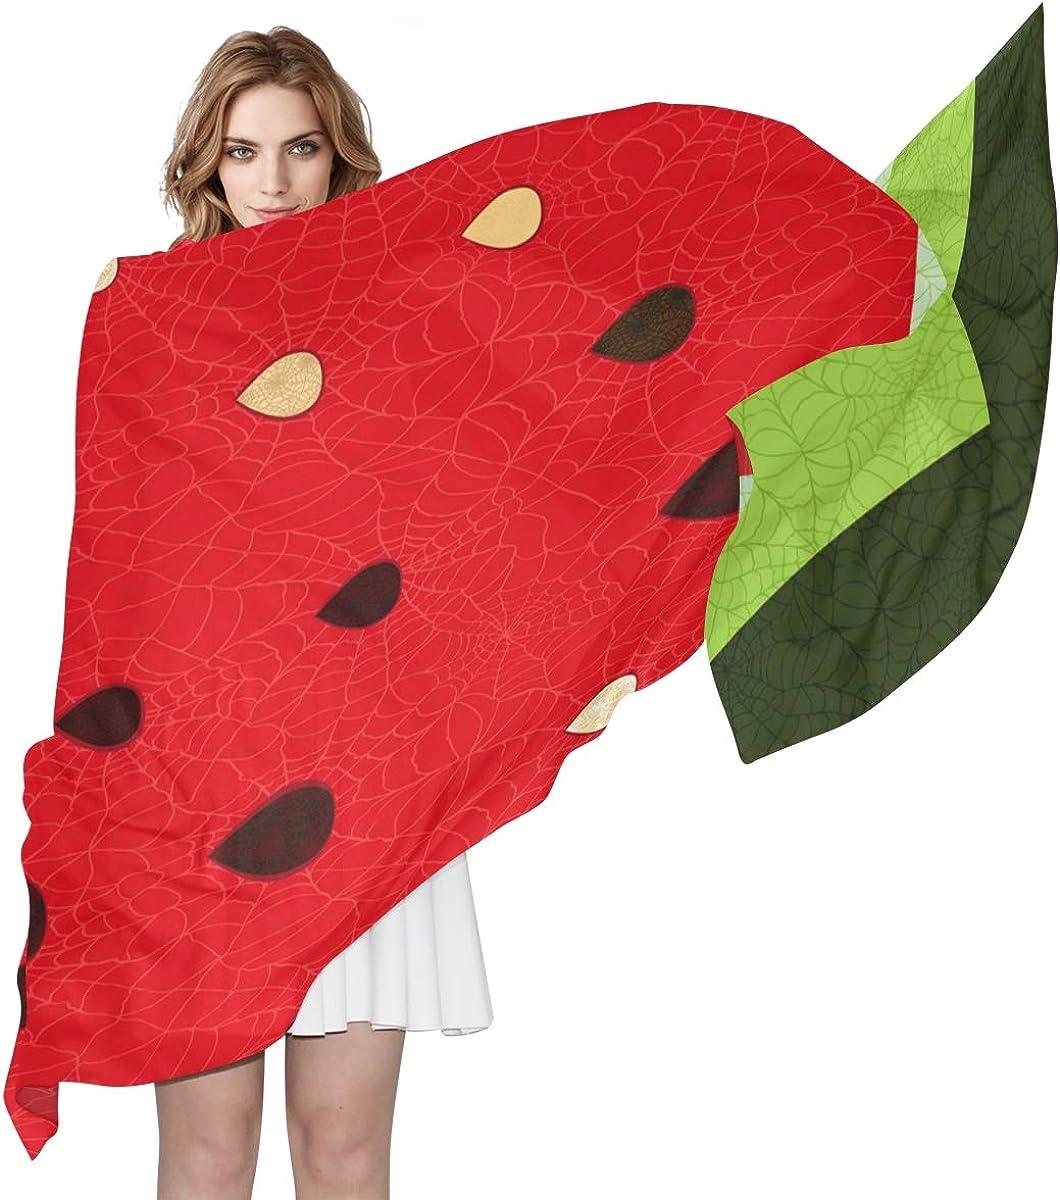 XLING Fashion Scarf Fruit Watermelon Texture Pattern Long Lightweight Sunscreen Scarf Shawl Wrap Muffler Neckerchief for Women Men